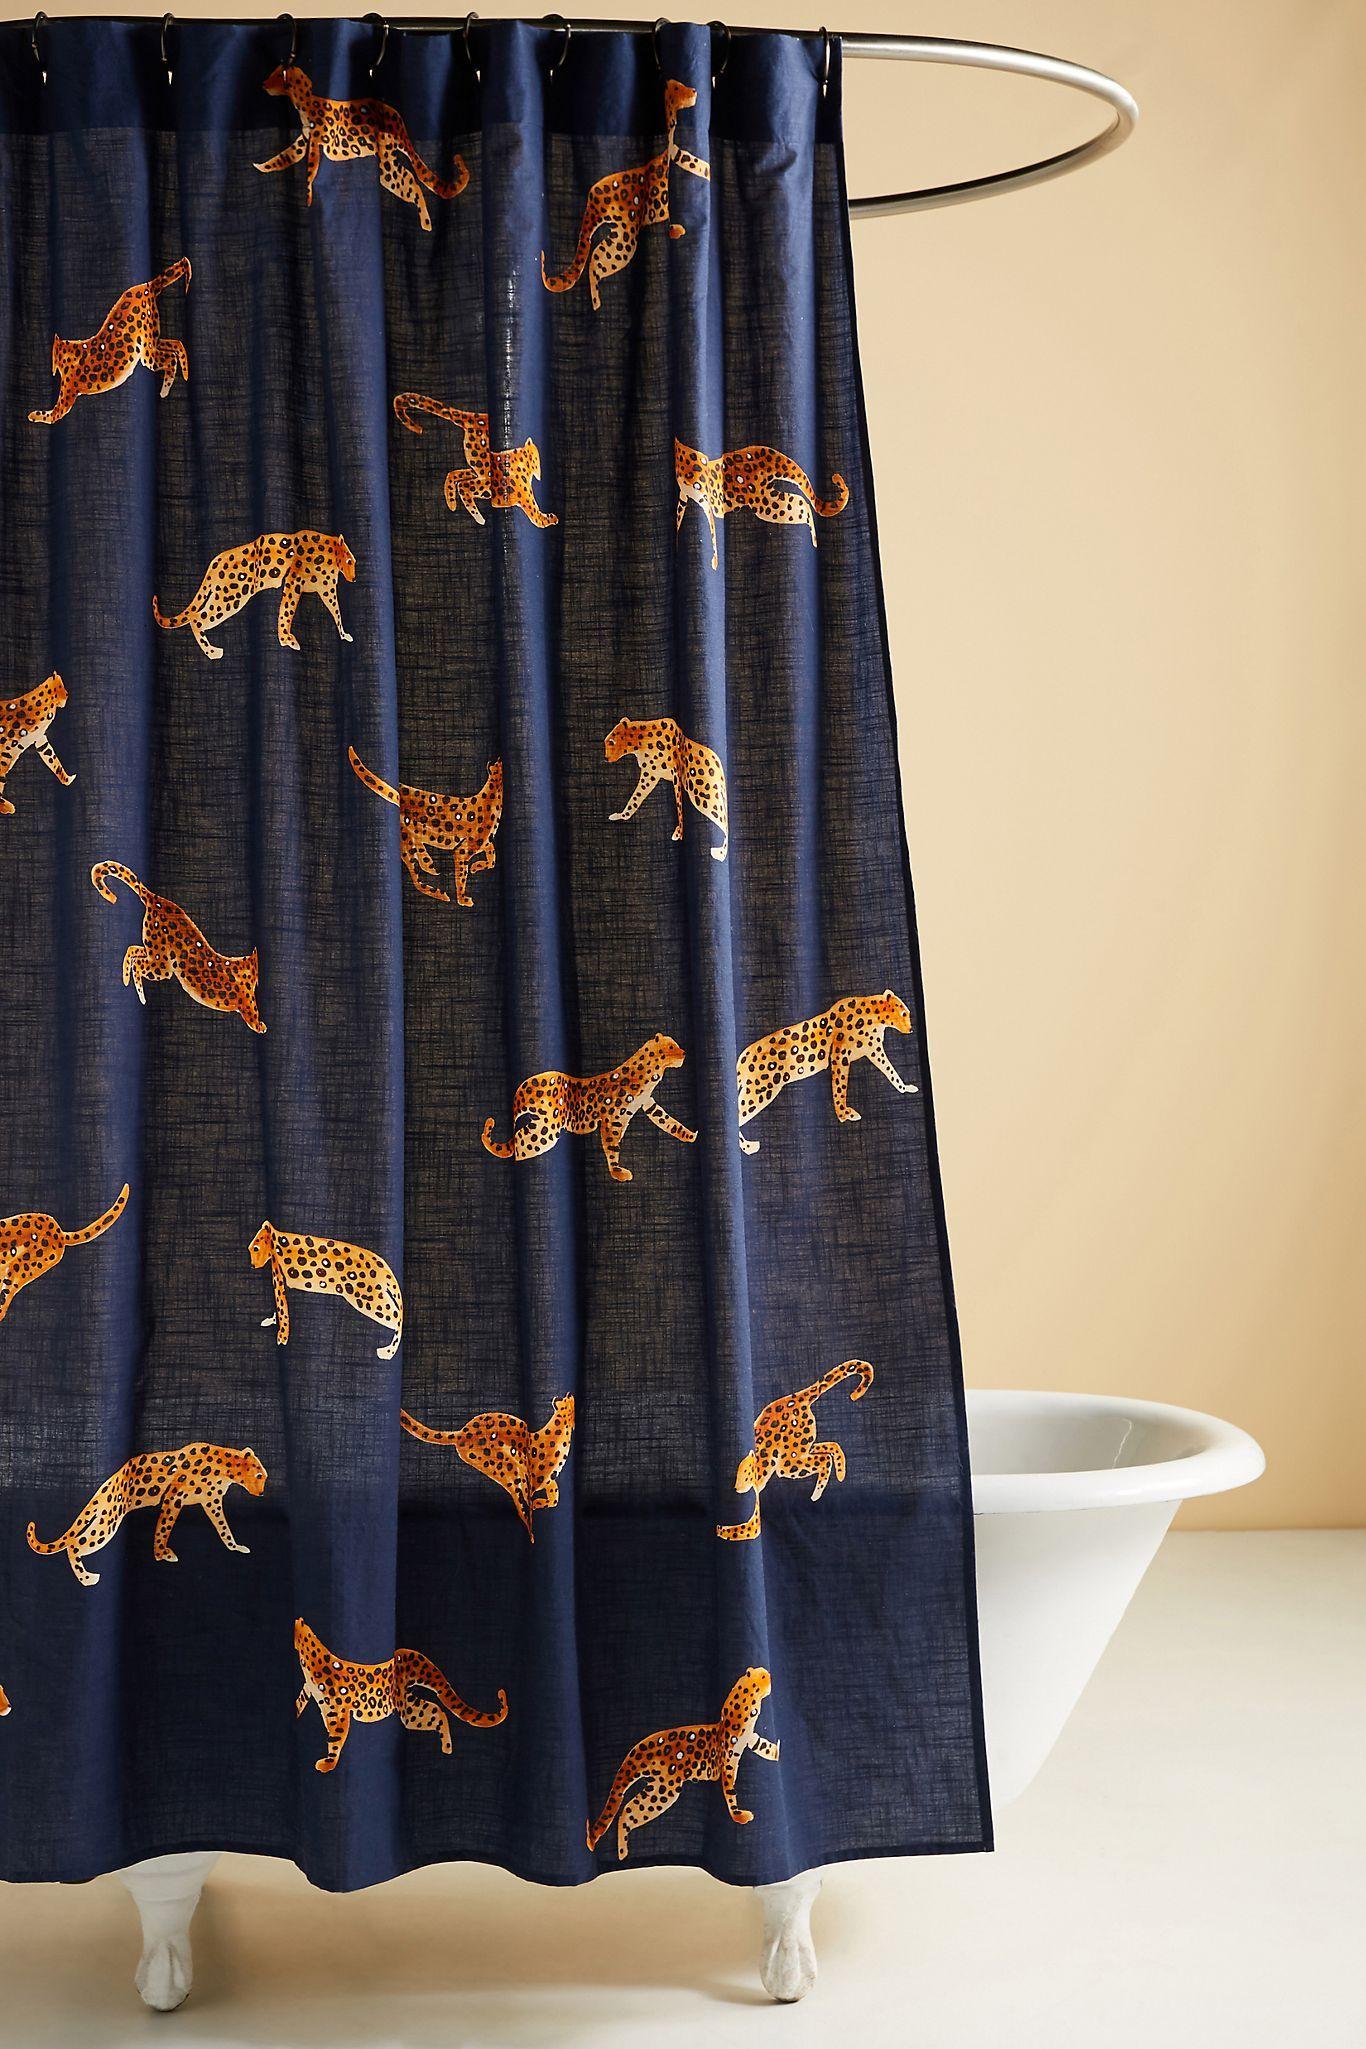 Leopard Shower Curtain Anthropologie In 2020 Bathroom Trends